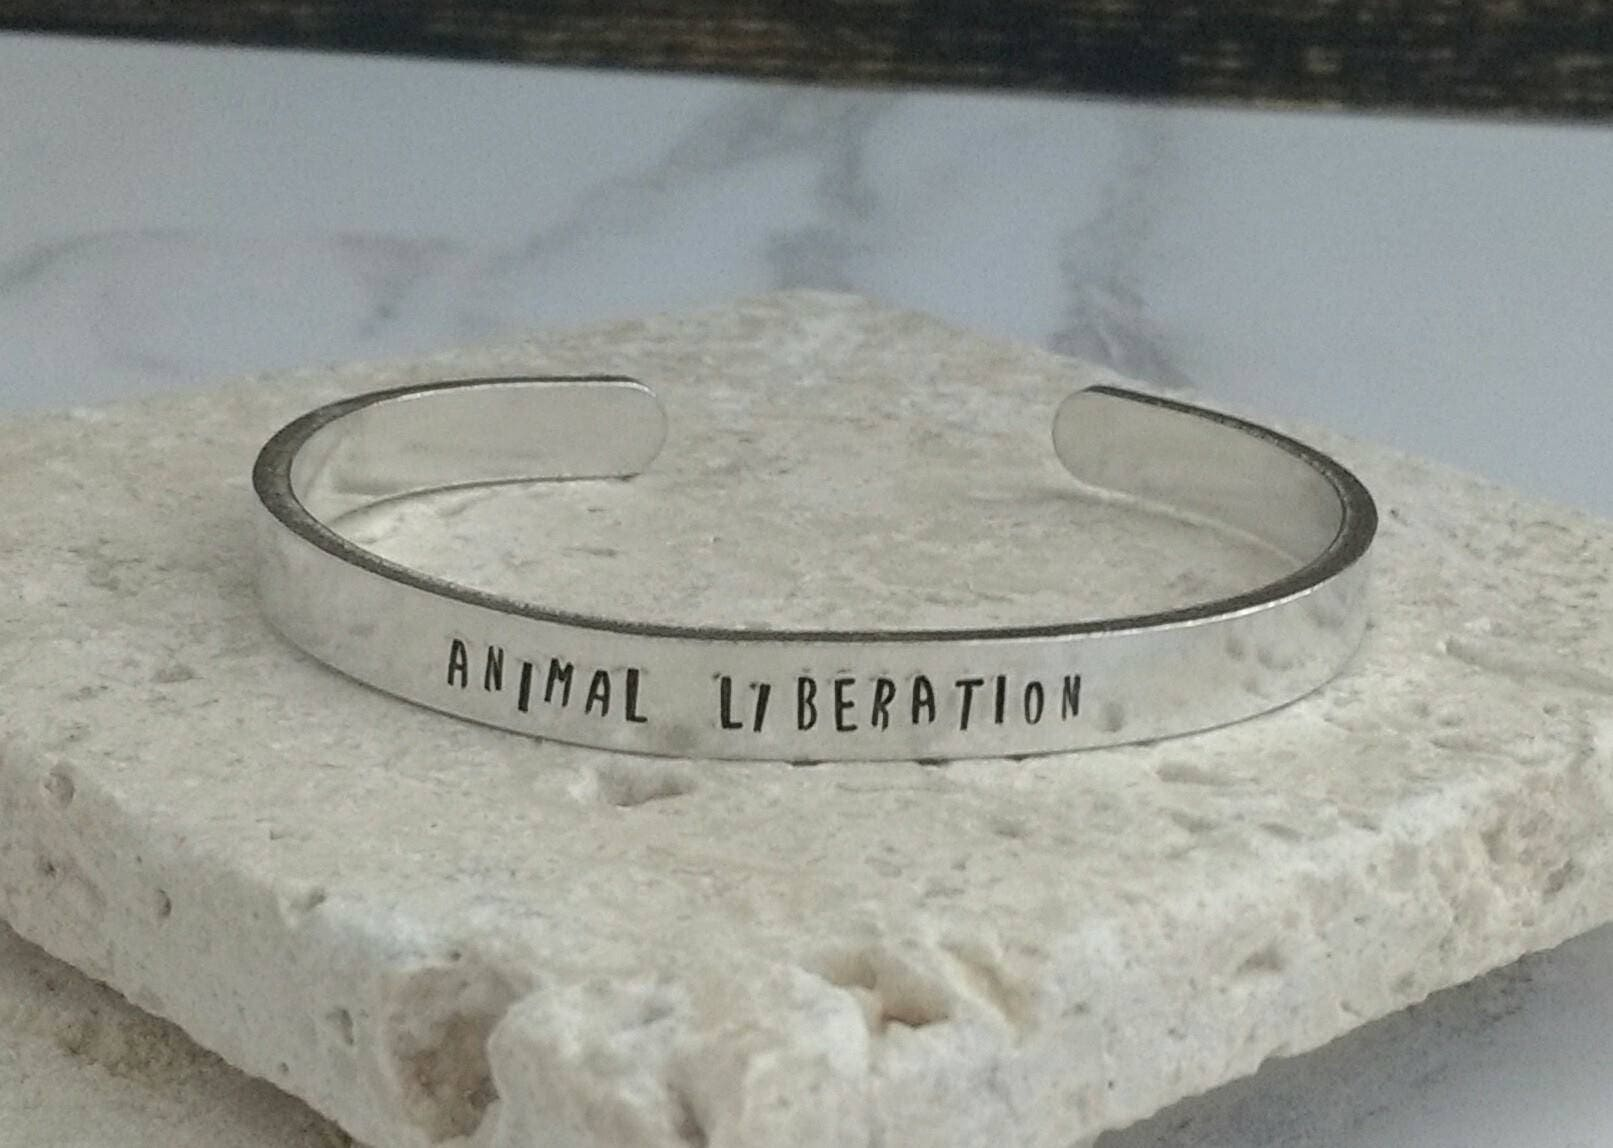 Animal liberation fun font bracelet - adjustable - handstamped - aluminium, copper, brass or sterling silver